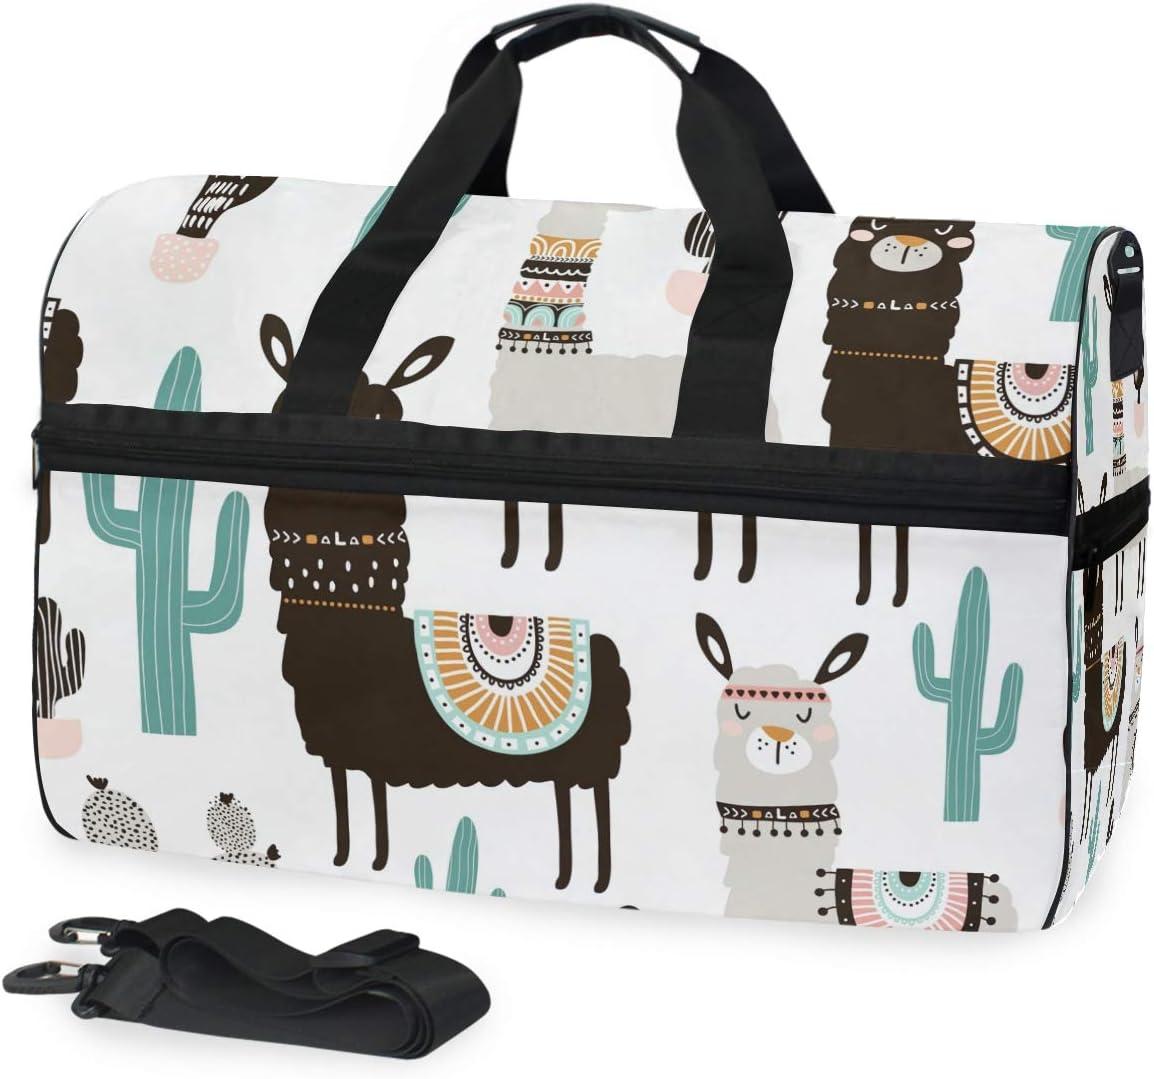 Travel Duffels Llama Cactus Duffle Bag Luggage Sports Gym for Women /& Men